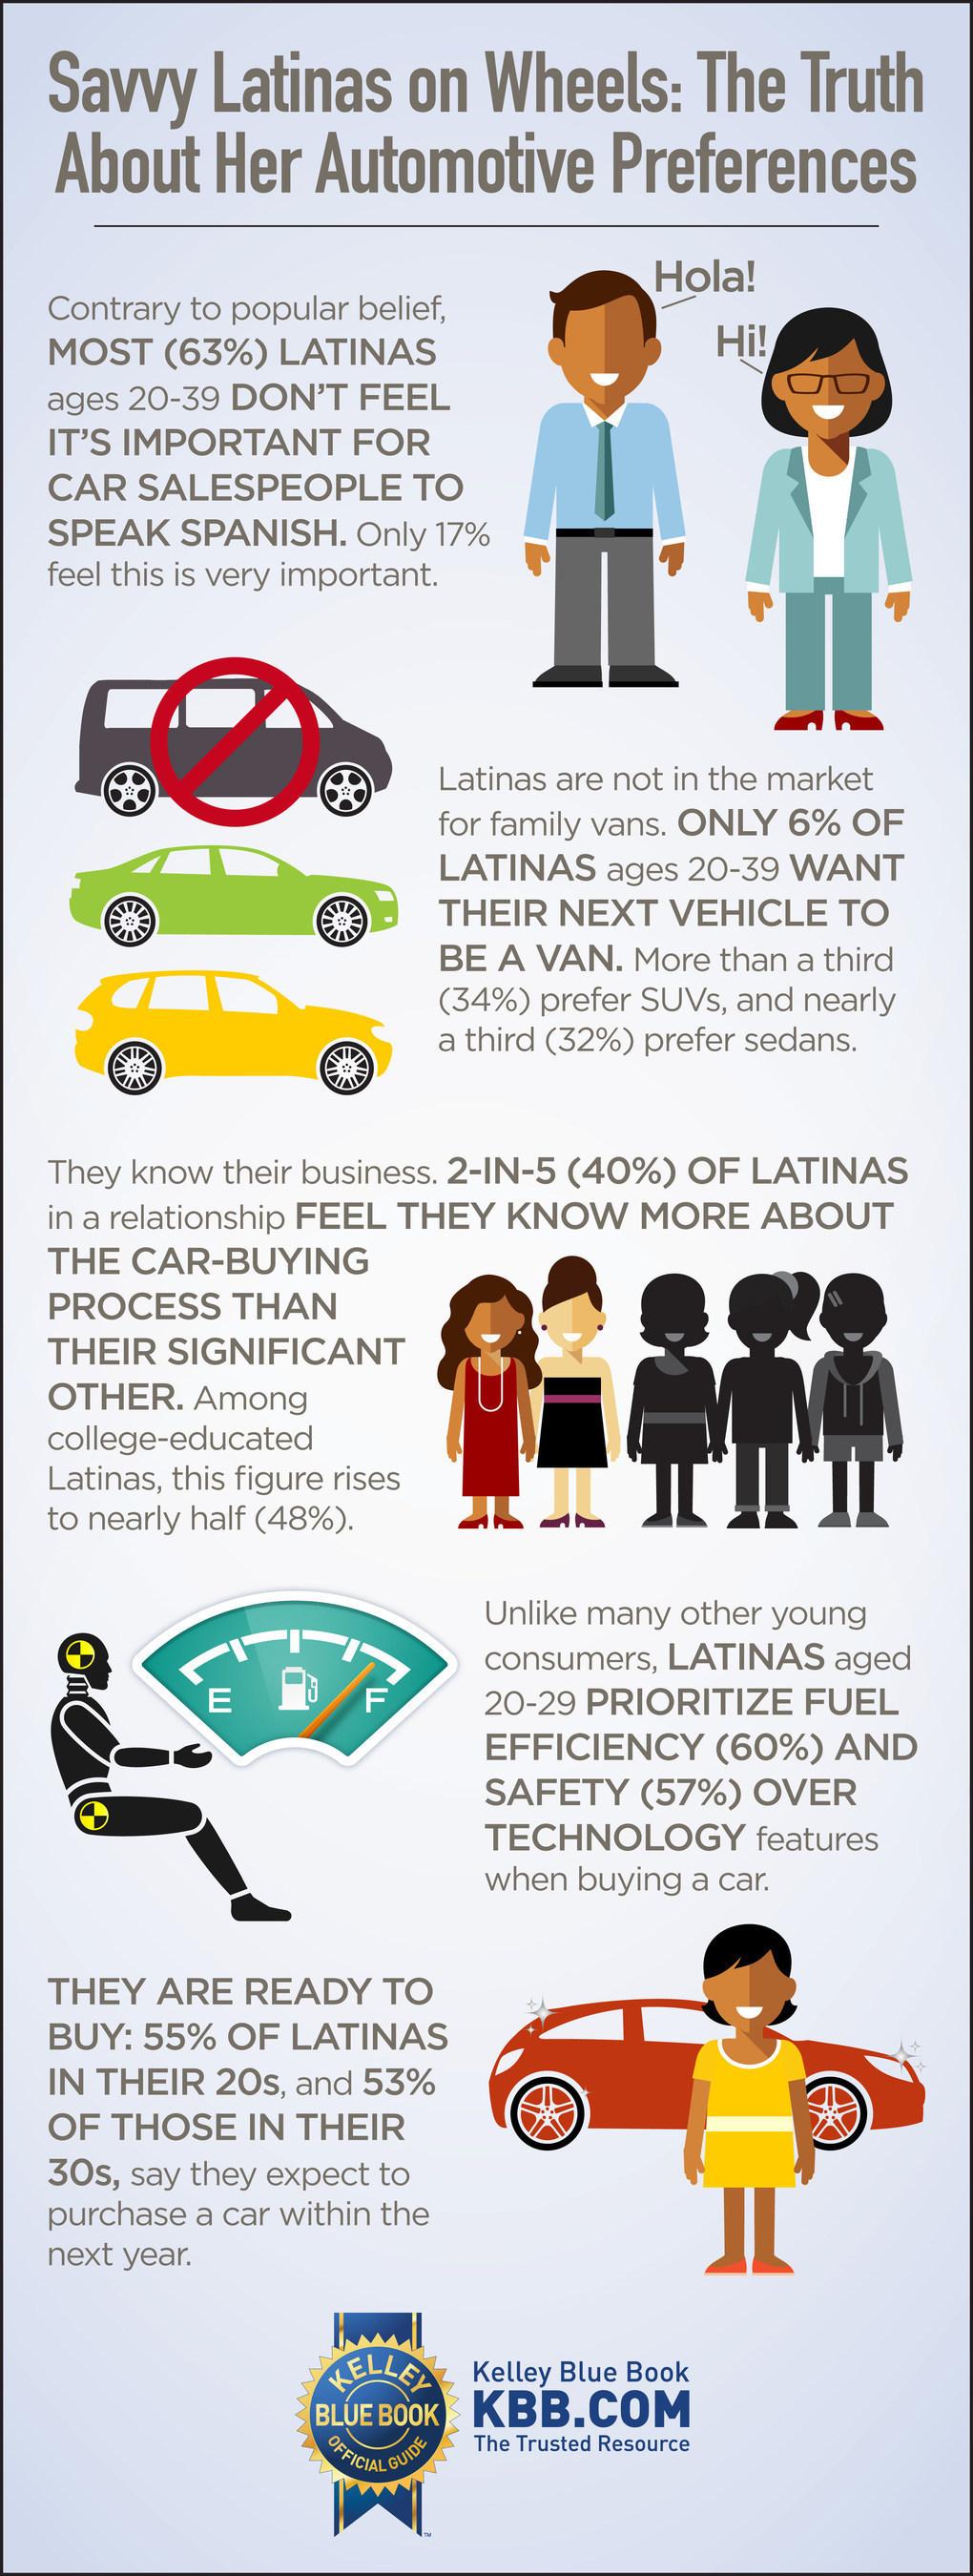 The 2016 Kelley Blue Book Latinas on Wheels Survey reveals Latinas' automotive preferences.